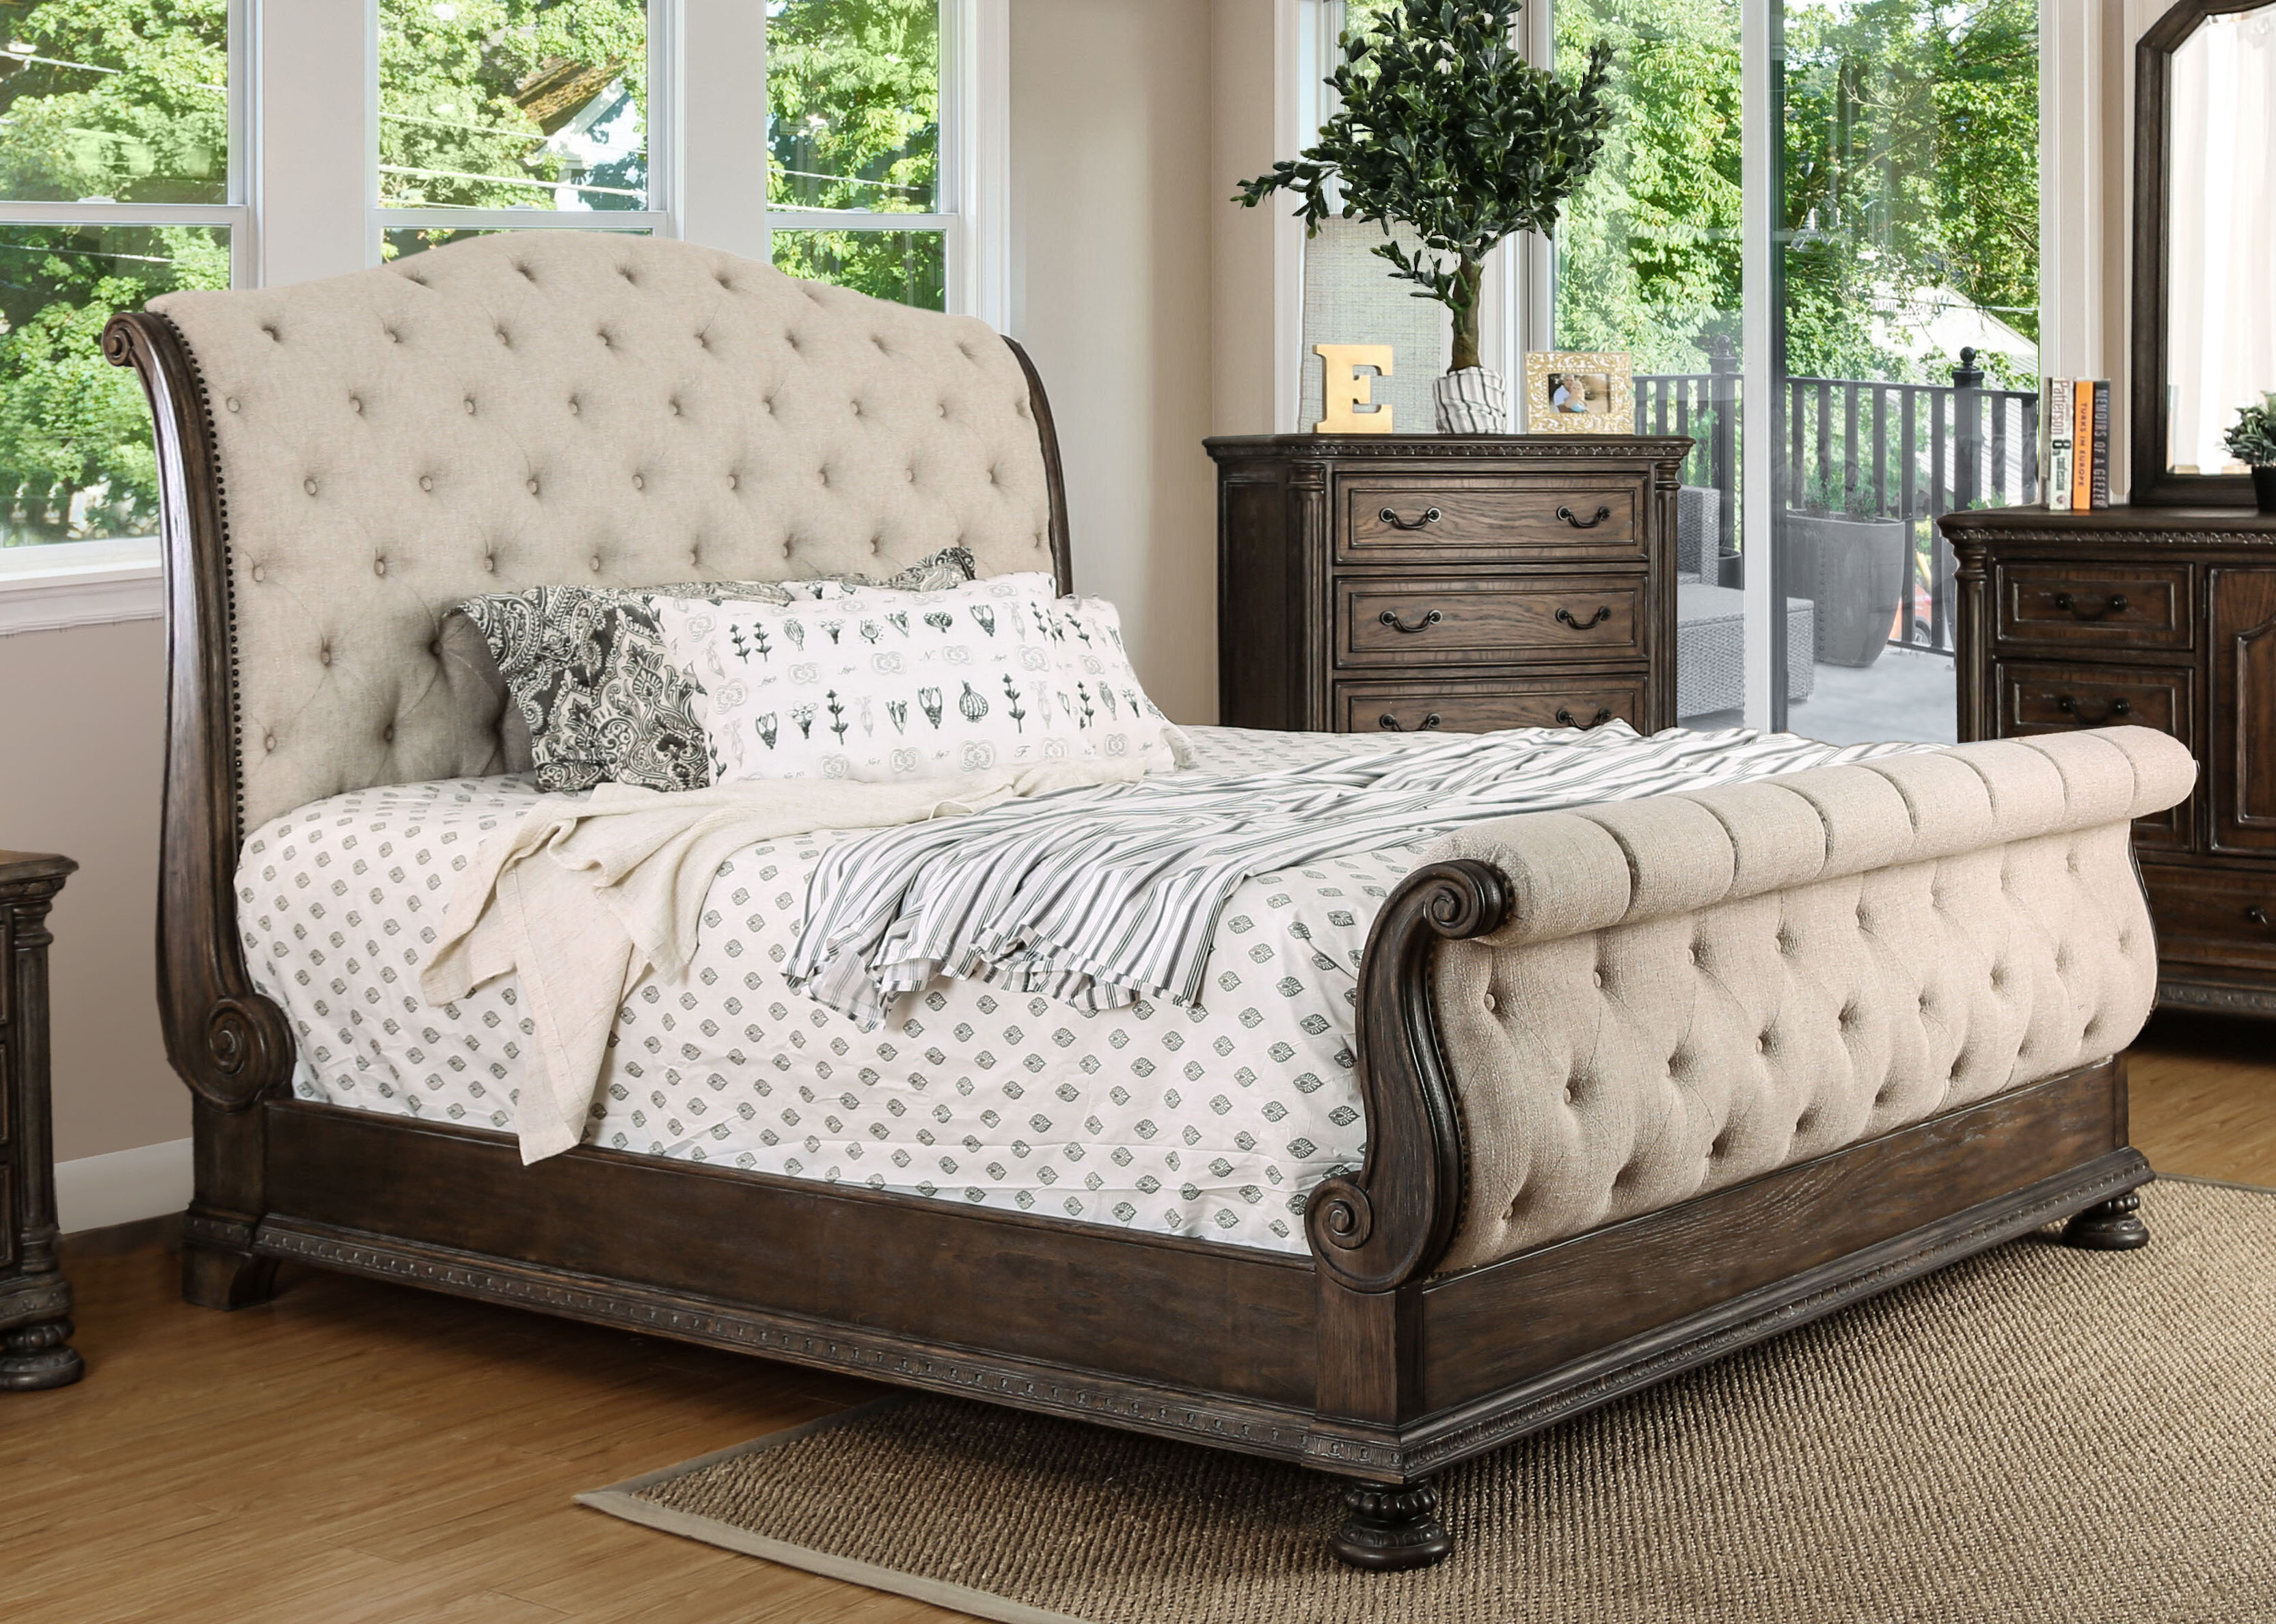 Astoria Grand Murillo Upholstered Sleigh Bed Reviews Wayfair